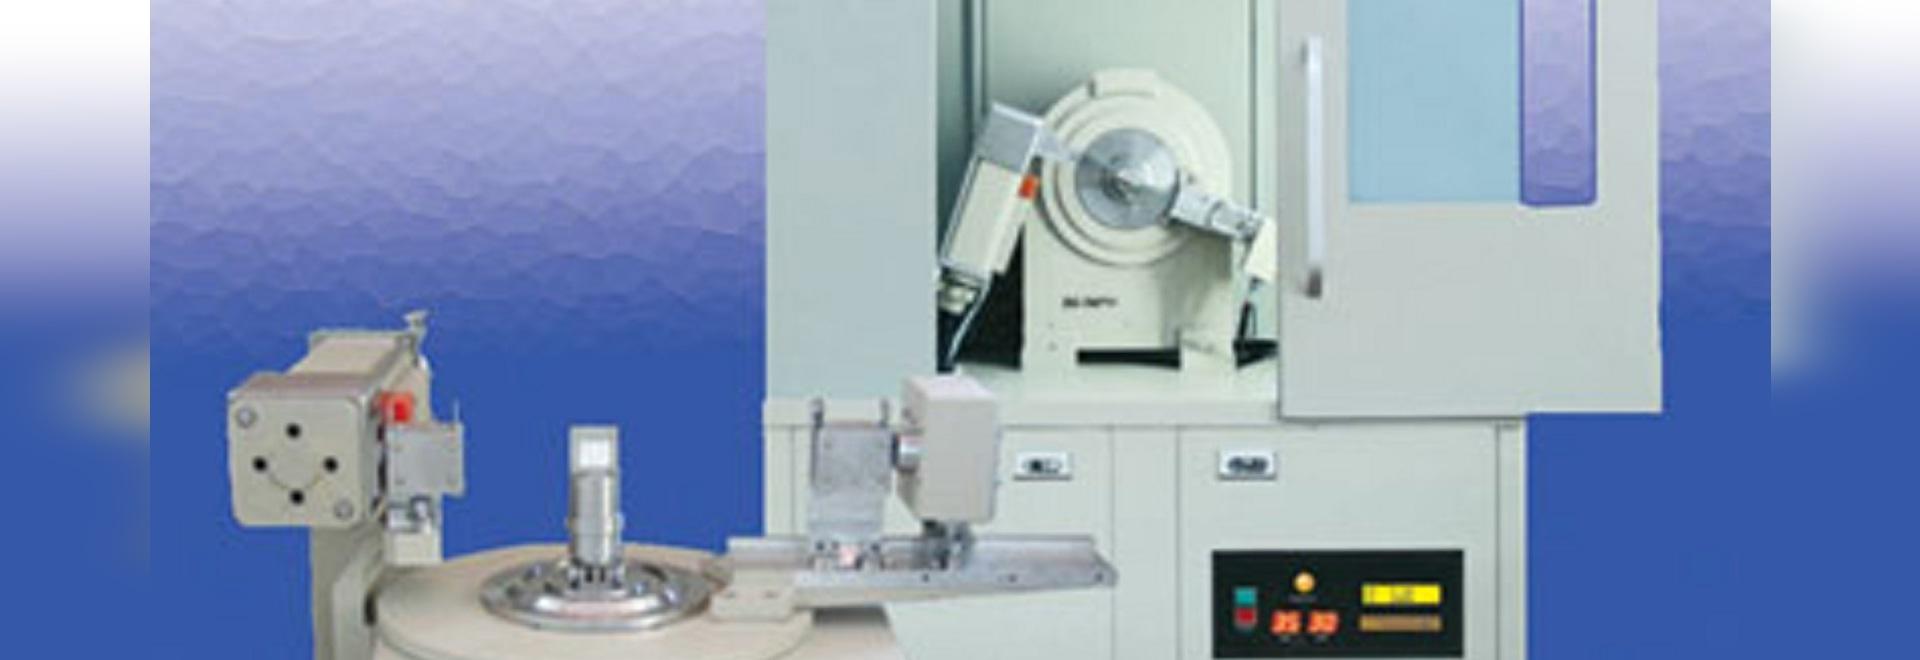 ADX-2700 θ-θ Powder X-ray Diffraction